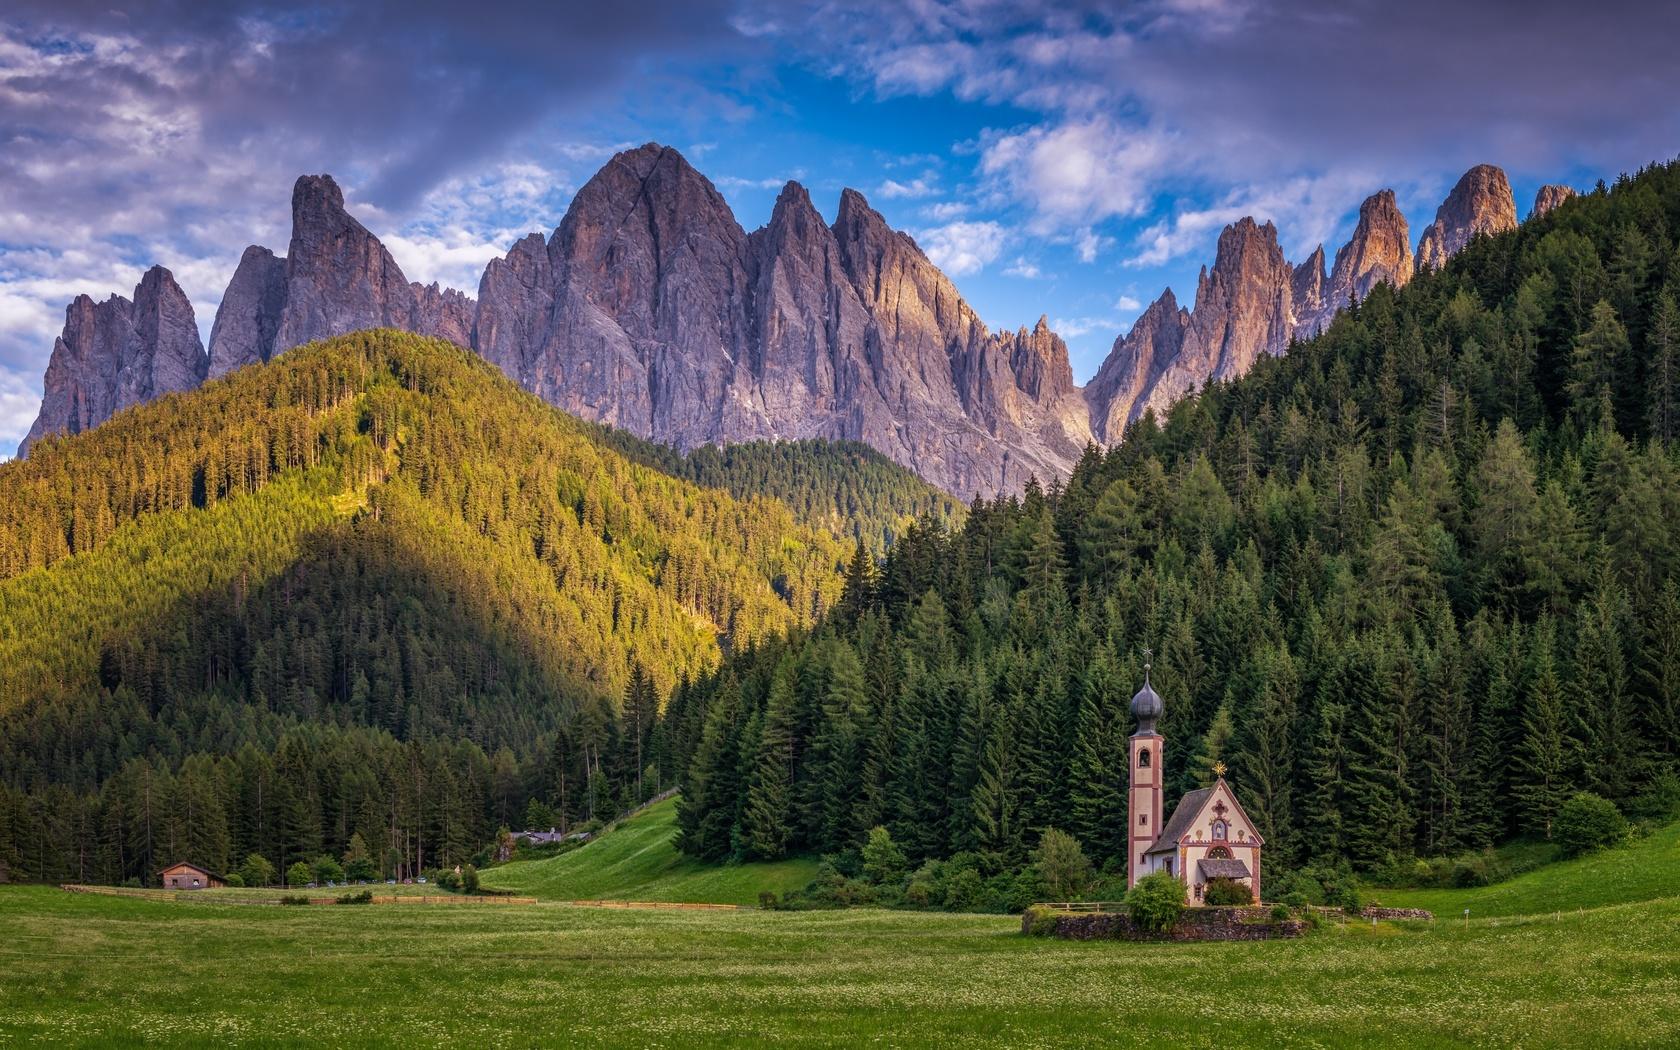 горы, лес, церковь, италия, dolomites, santa maddalena, альпы, природа